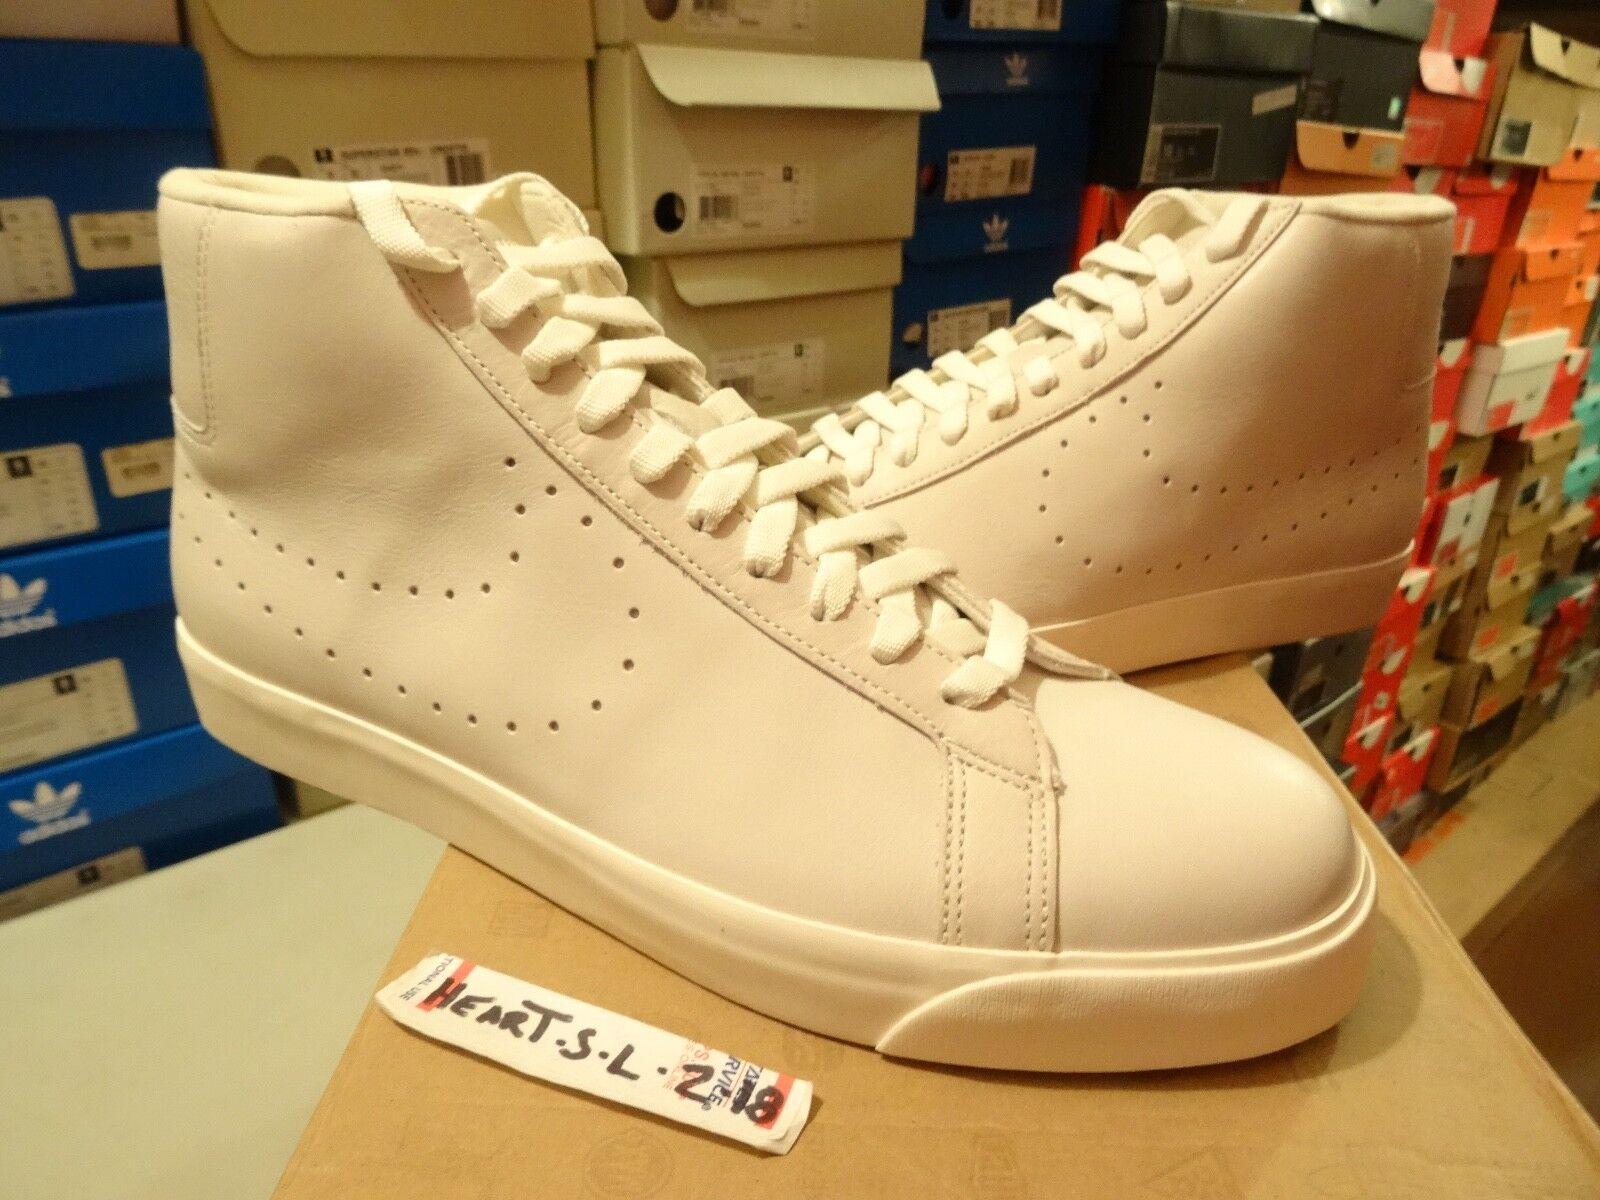 NEW NIKE SB Blazer Mid Supreme WHITE PERF TZ 380670 111 SZ 13 RARE DUNK NYC LOGO